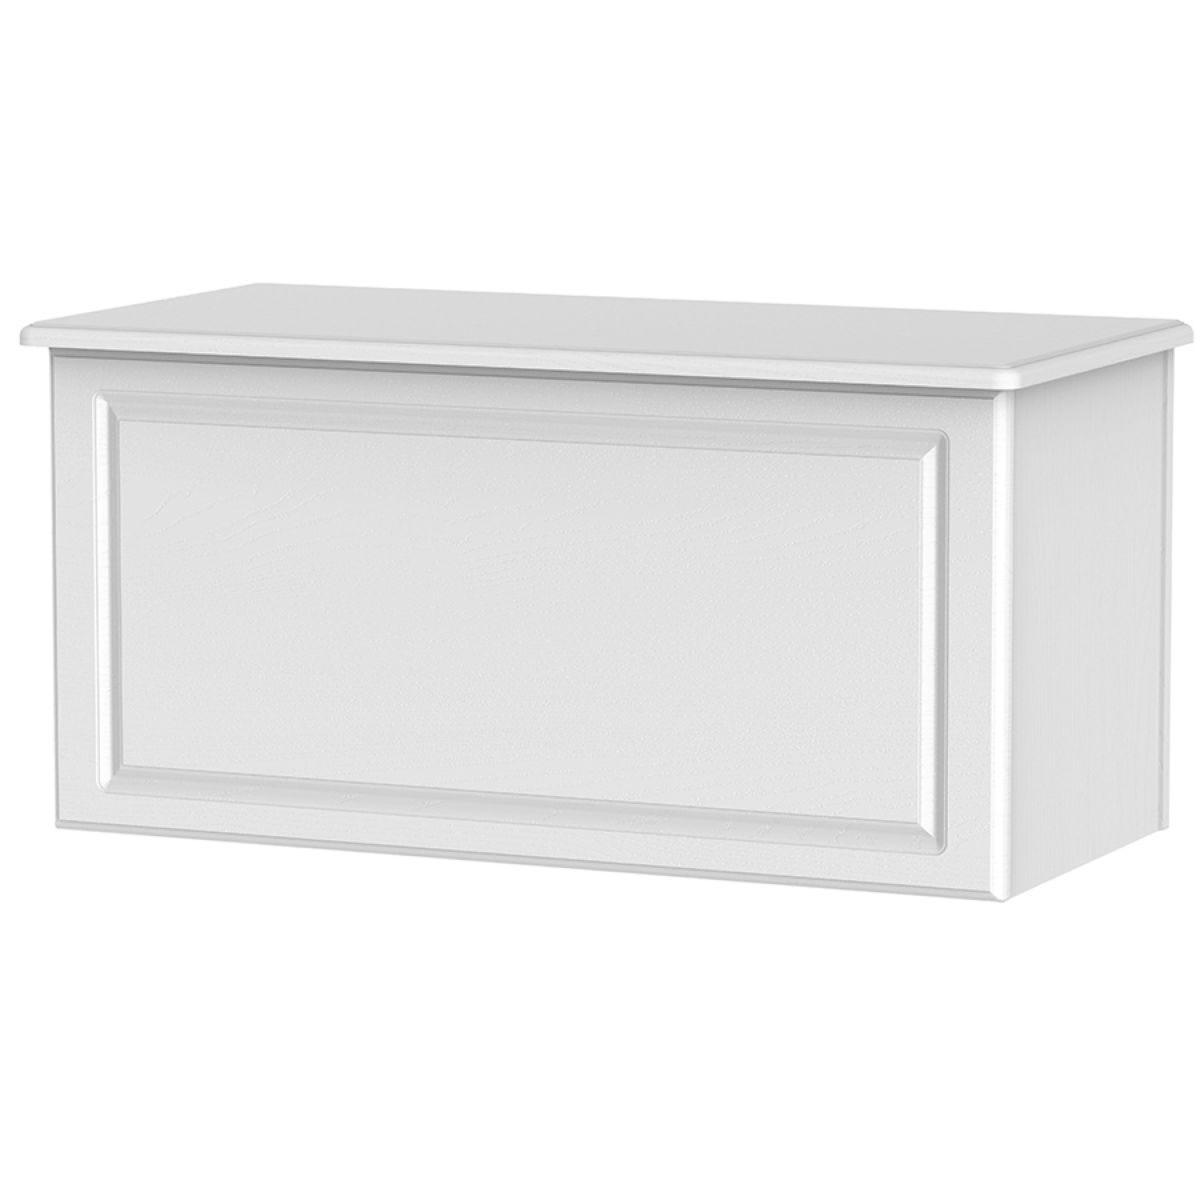 Montego Blanket Box - White